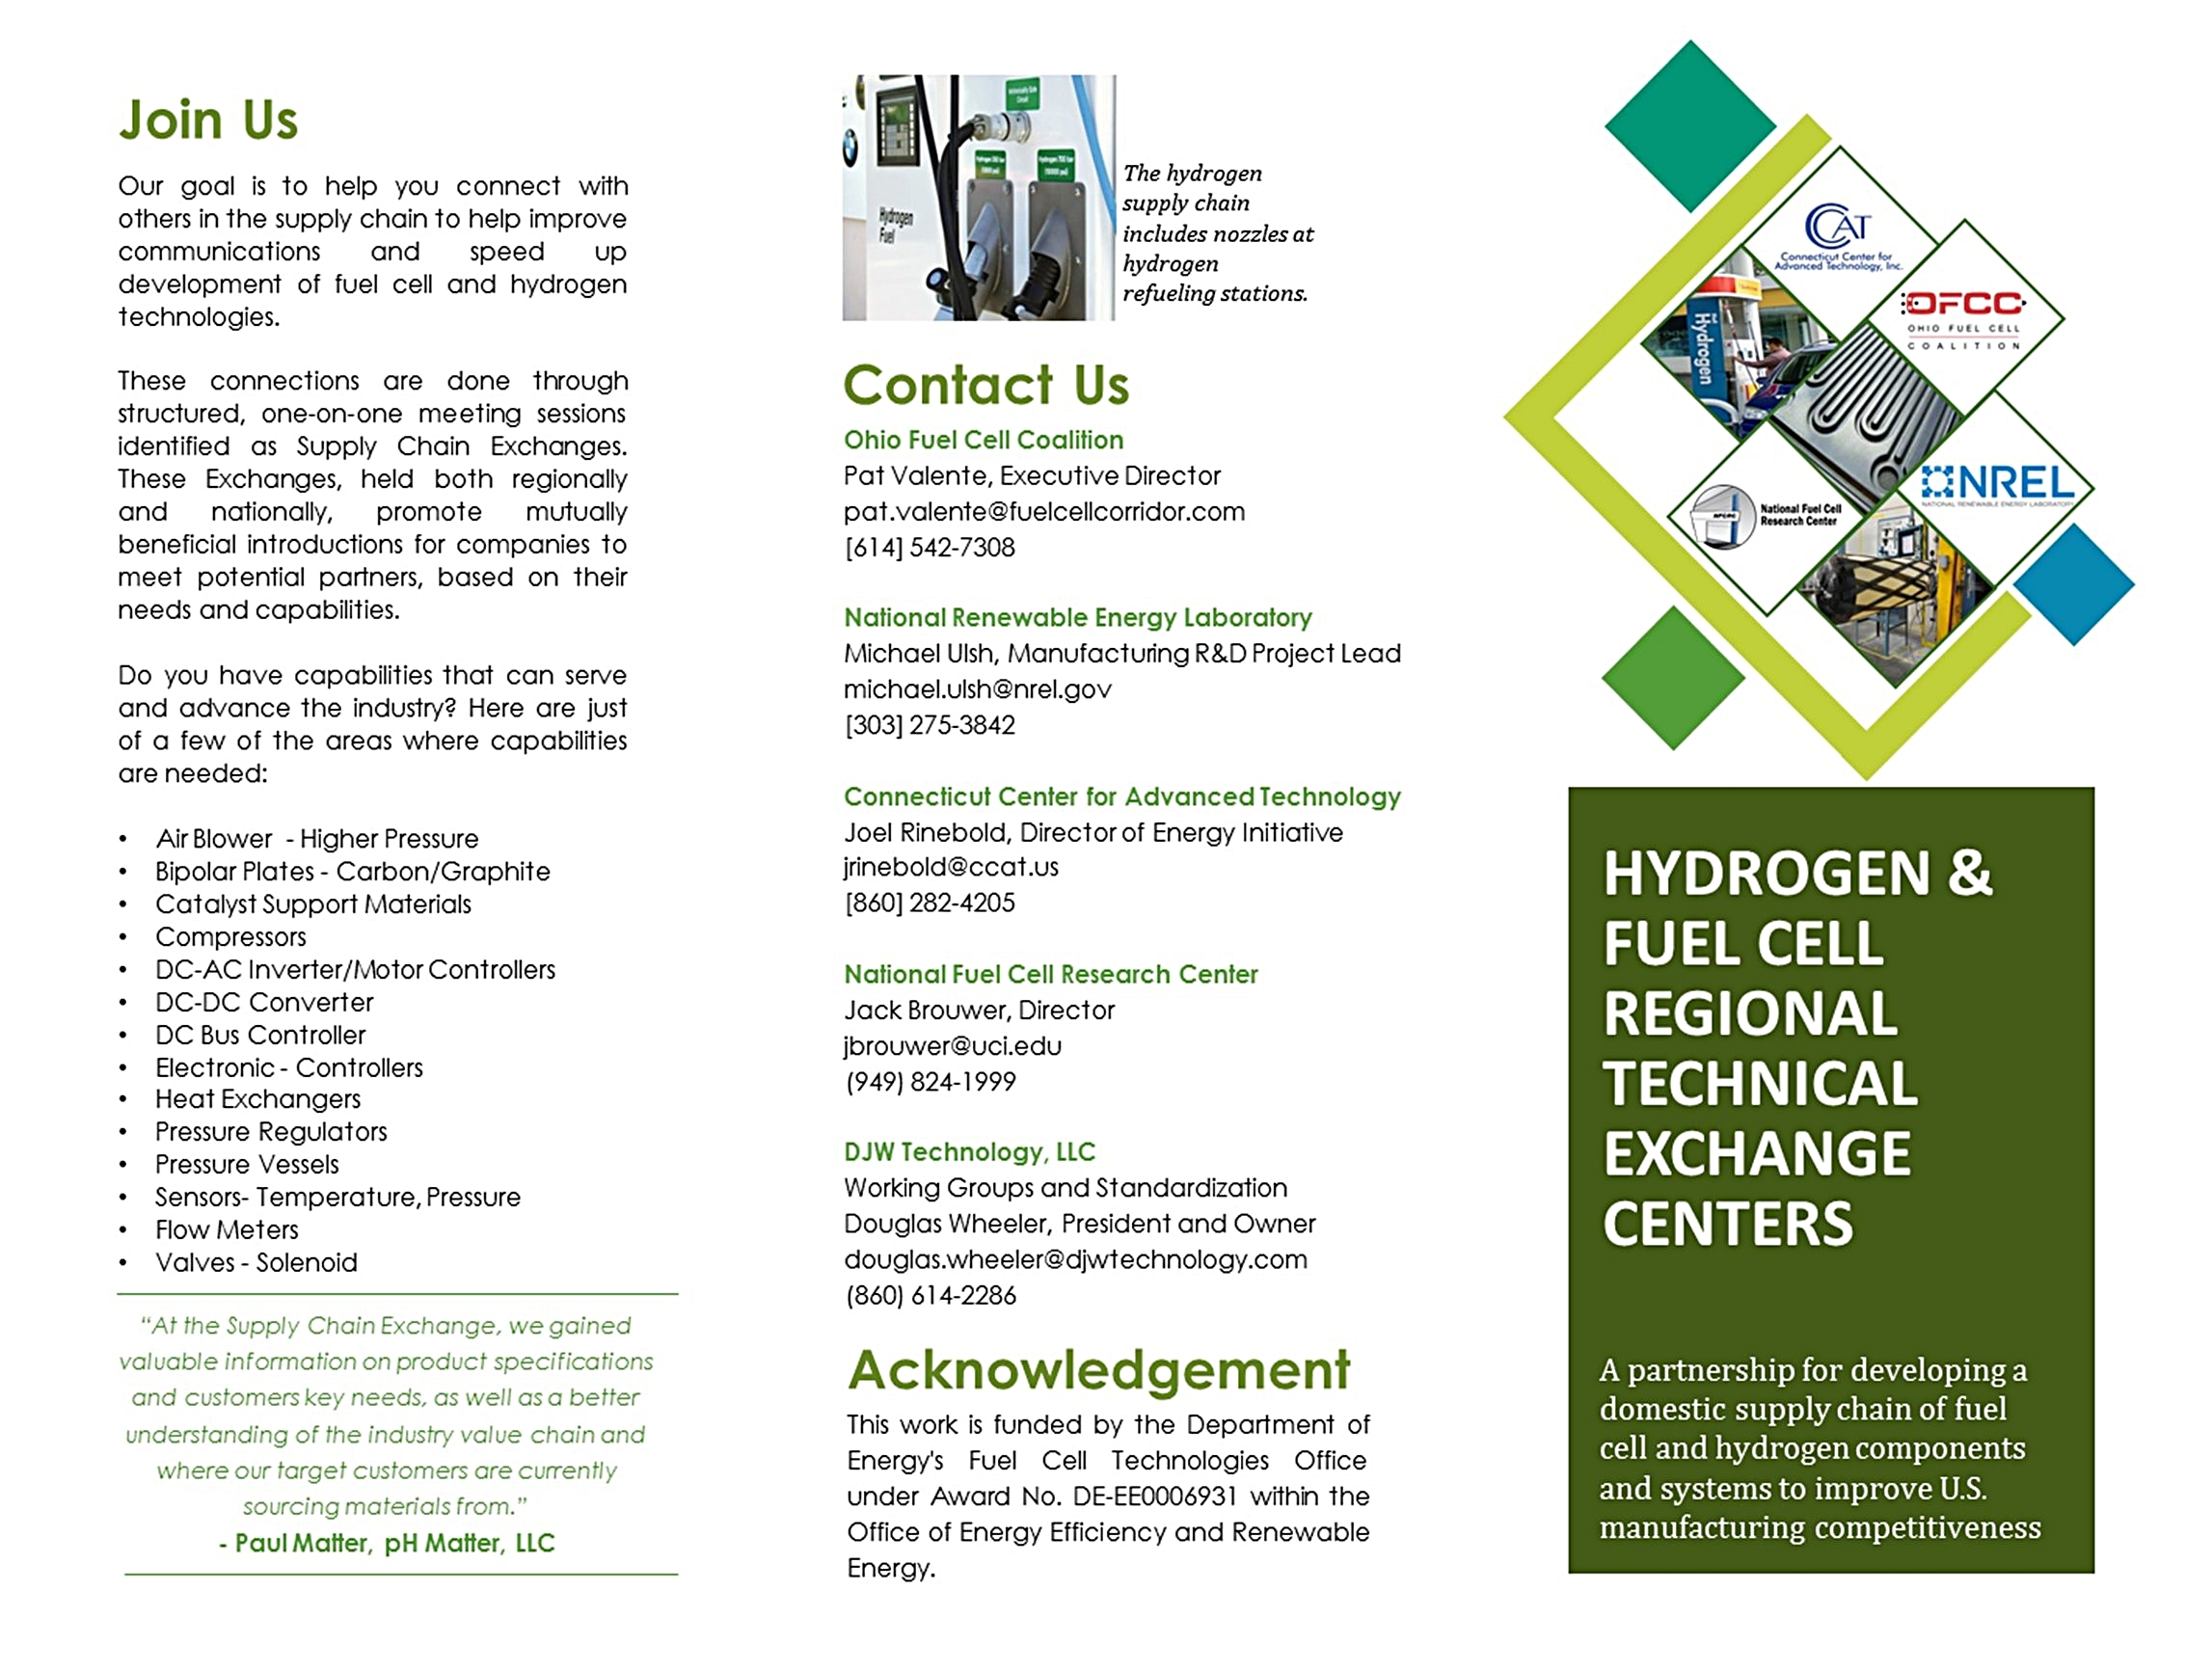 Brochure-Regional Technical Exchange Centers-11.30.18 pg 1.jpg